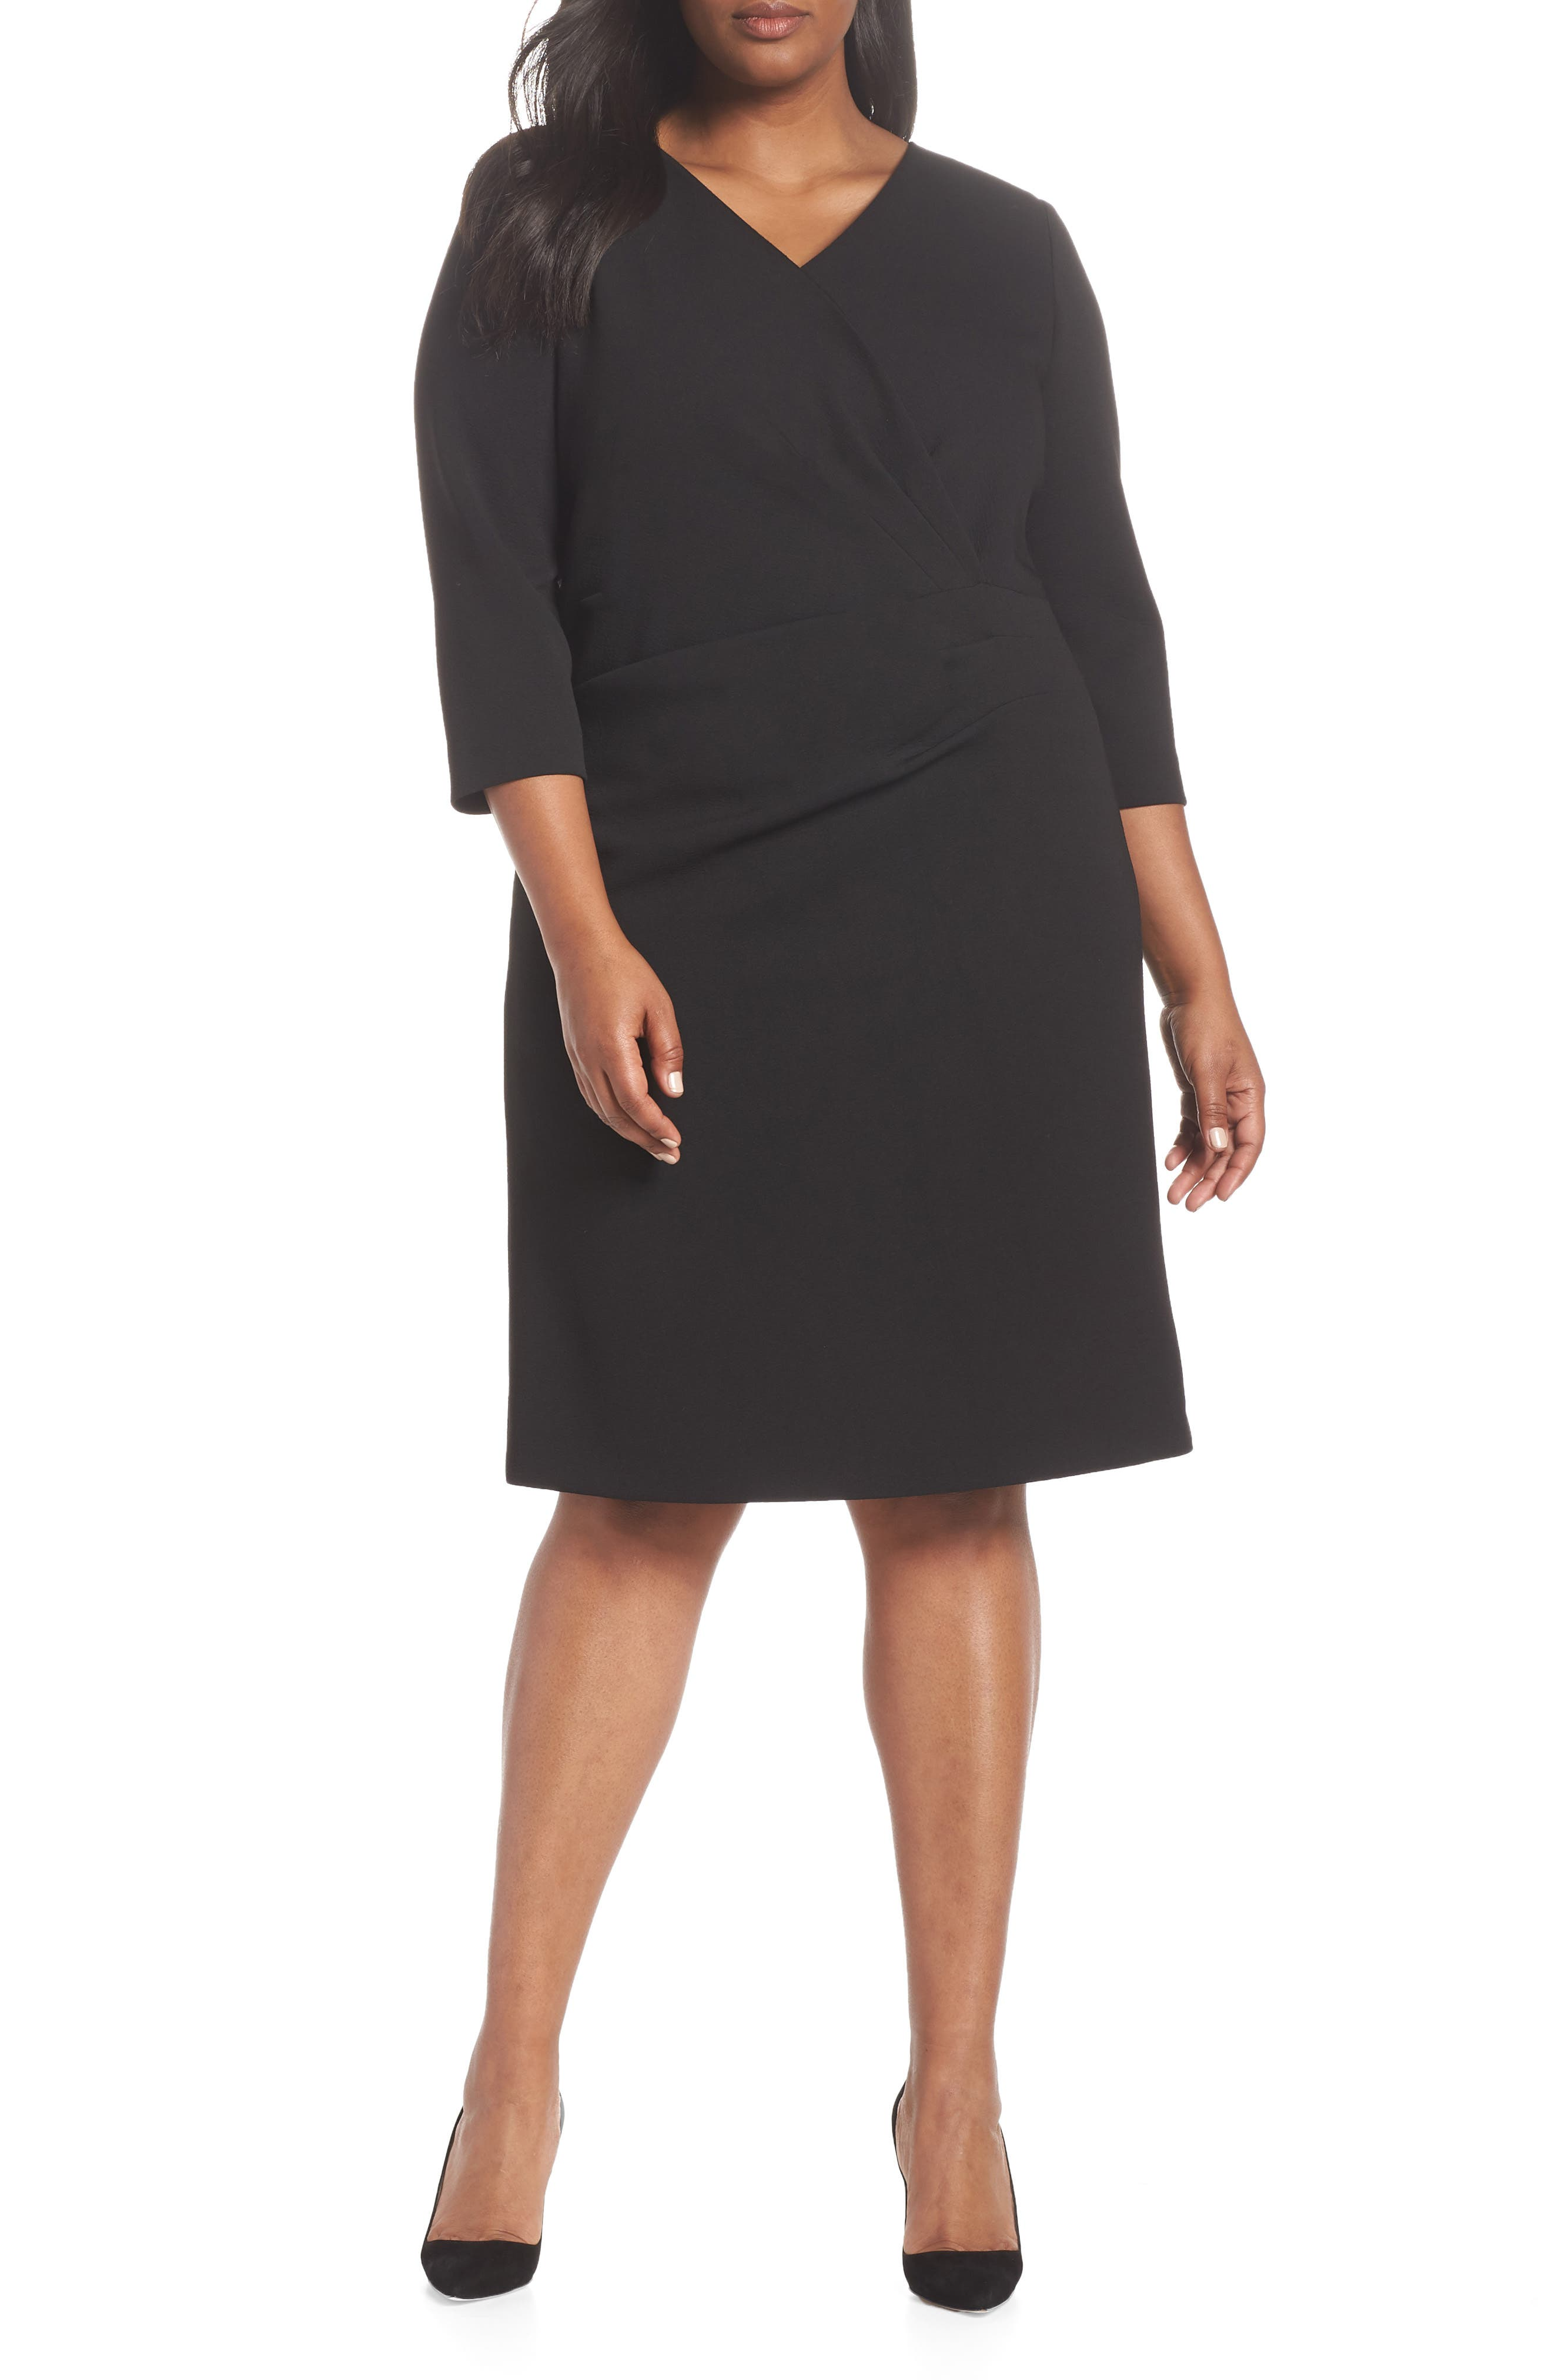 TAHARI, Ruched Surplice Crepe Sheath Dress, Main thumbnail 1, color, BLACK